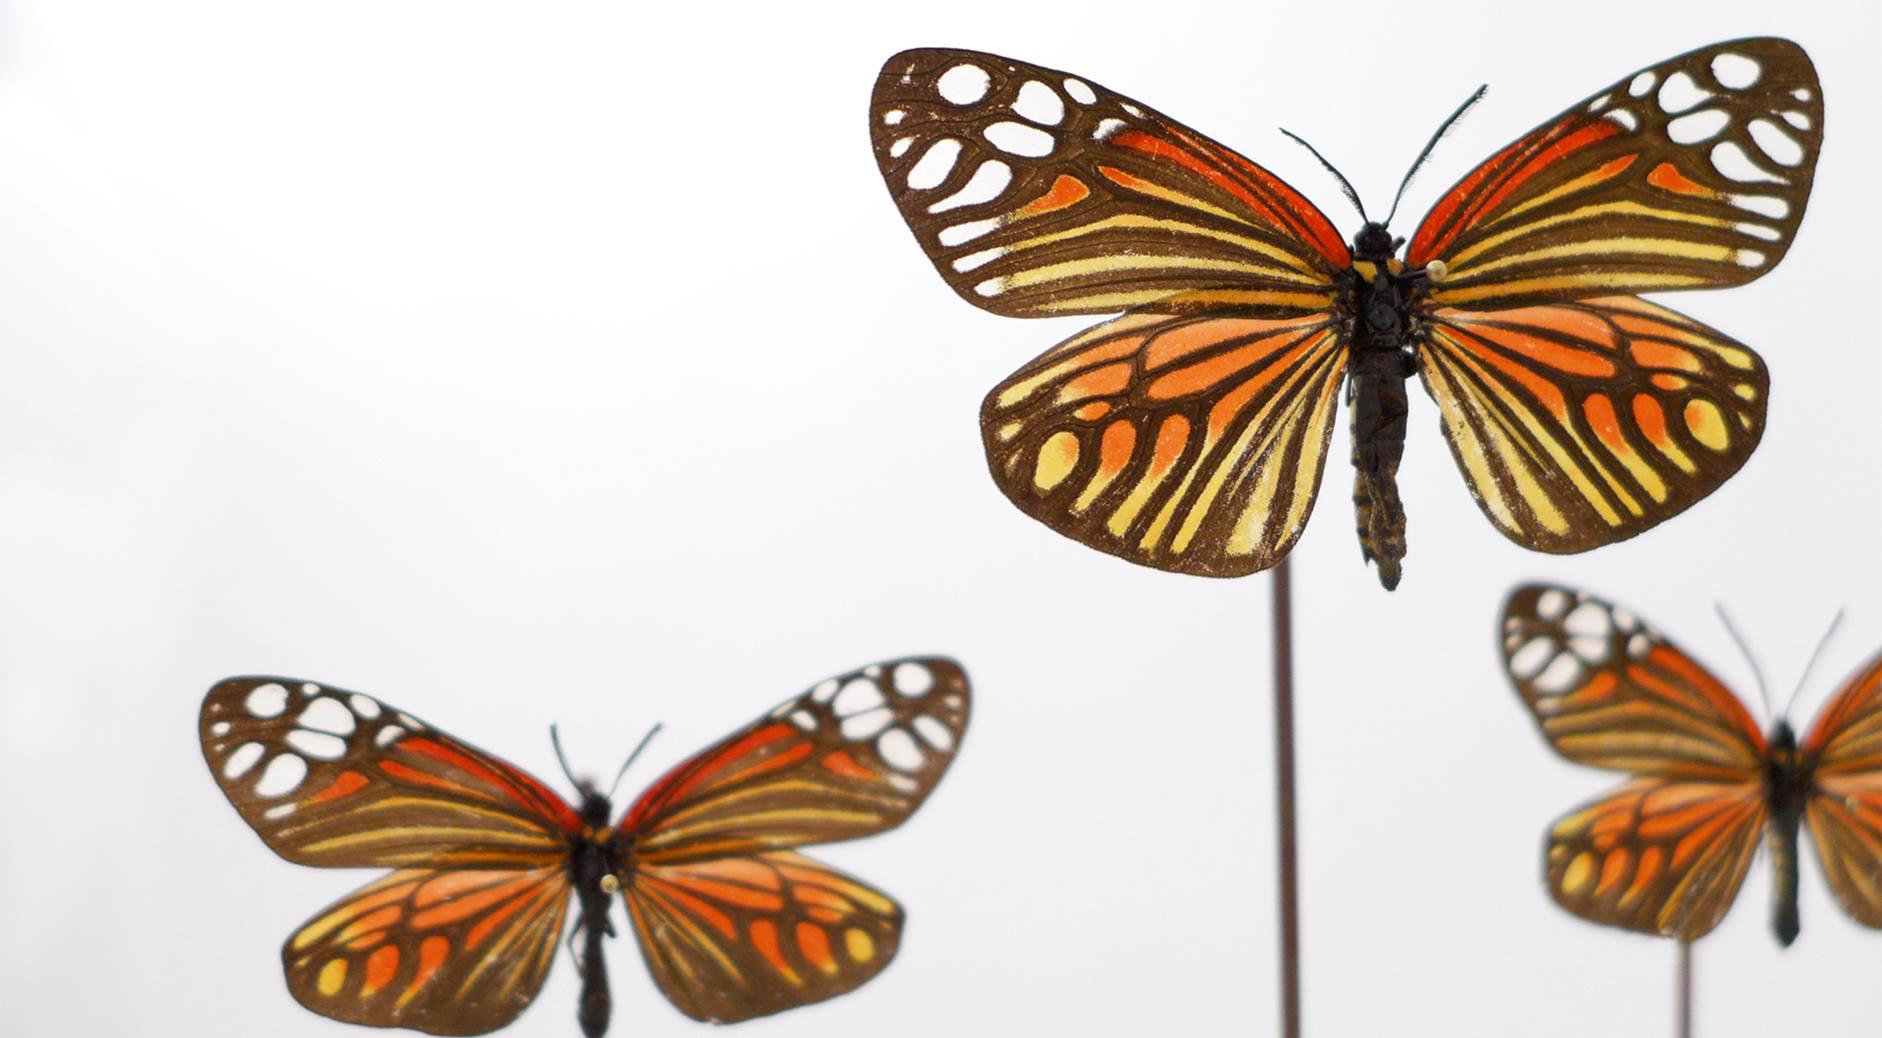 Lepidoptera Zygaenidae Campylotes Histrionicus